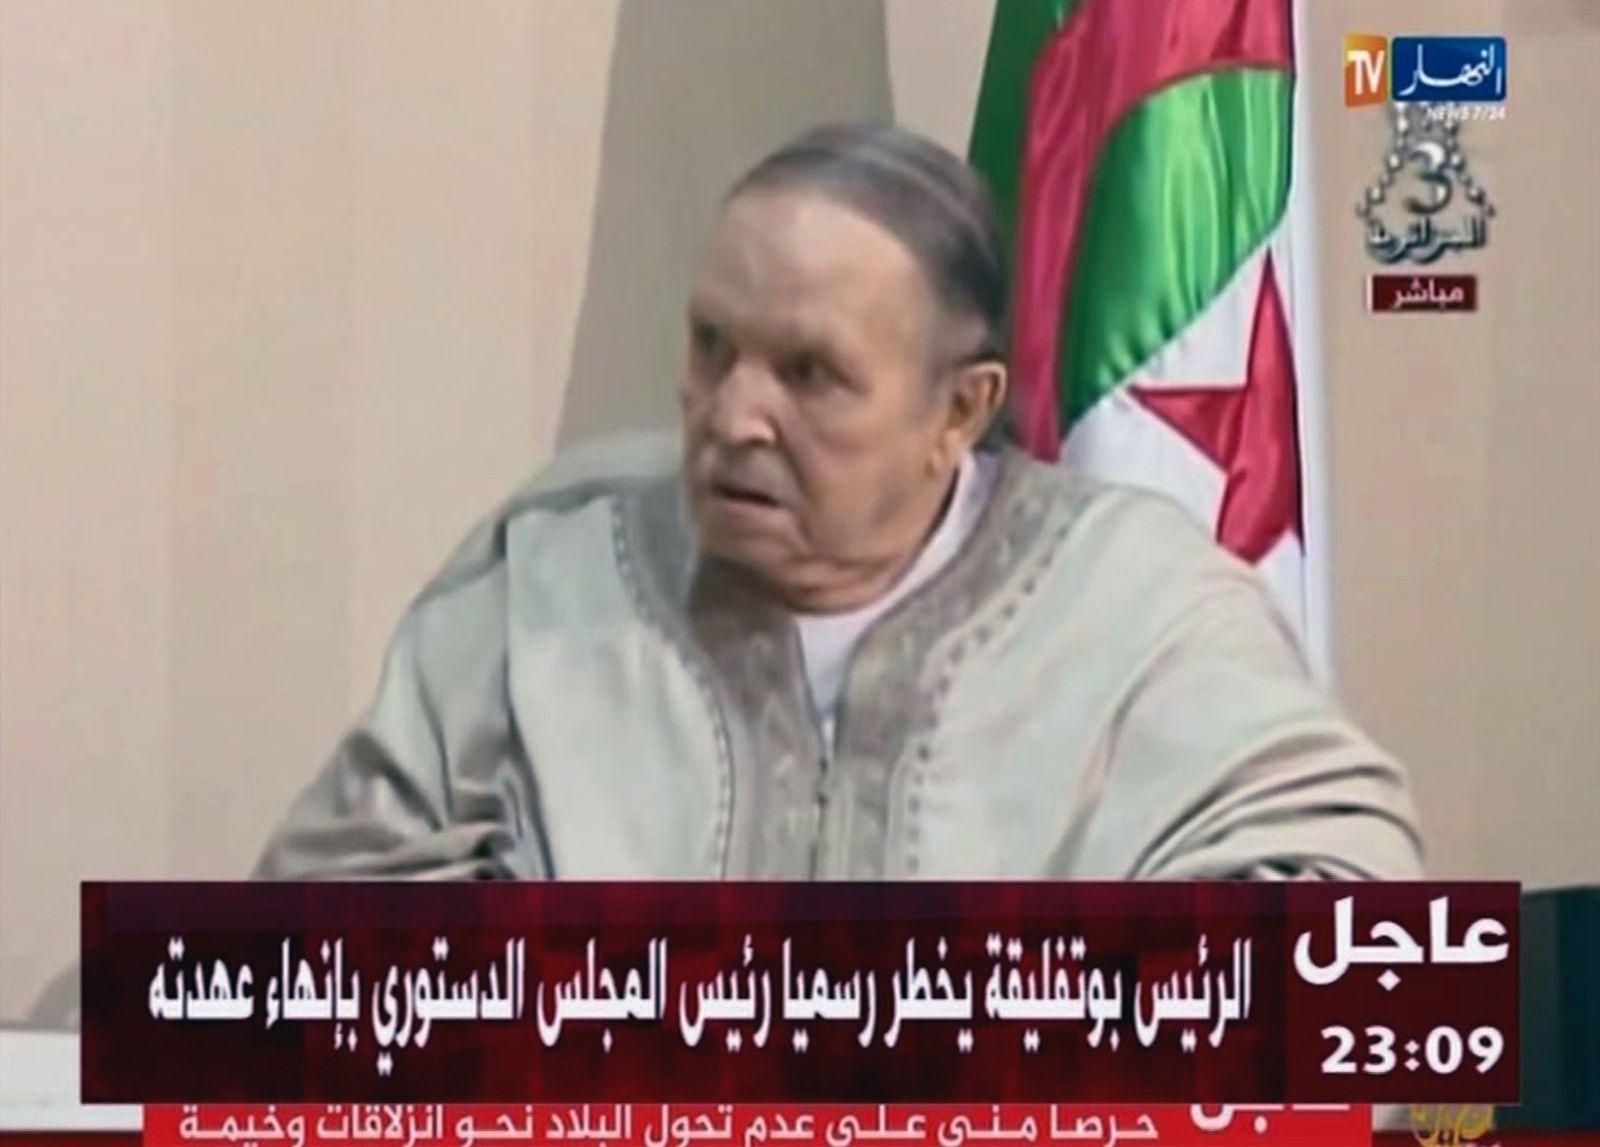 Rücktritt von Algeriens Präsident Bouteflika